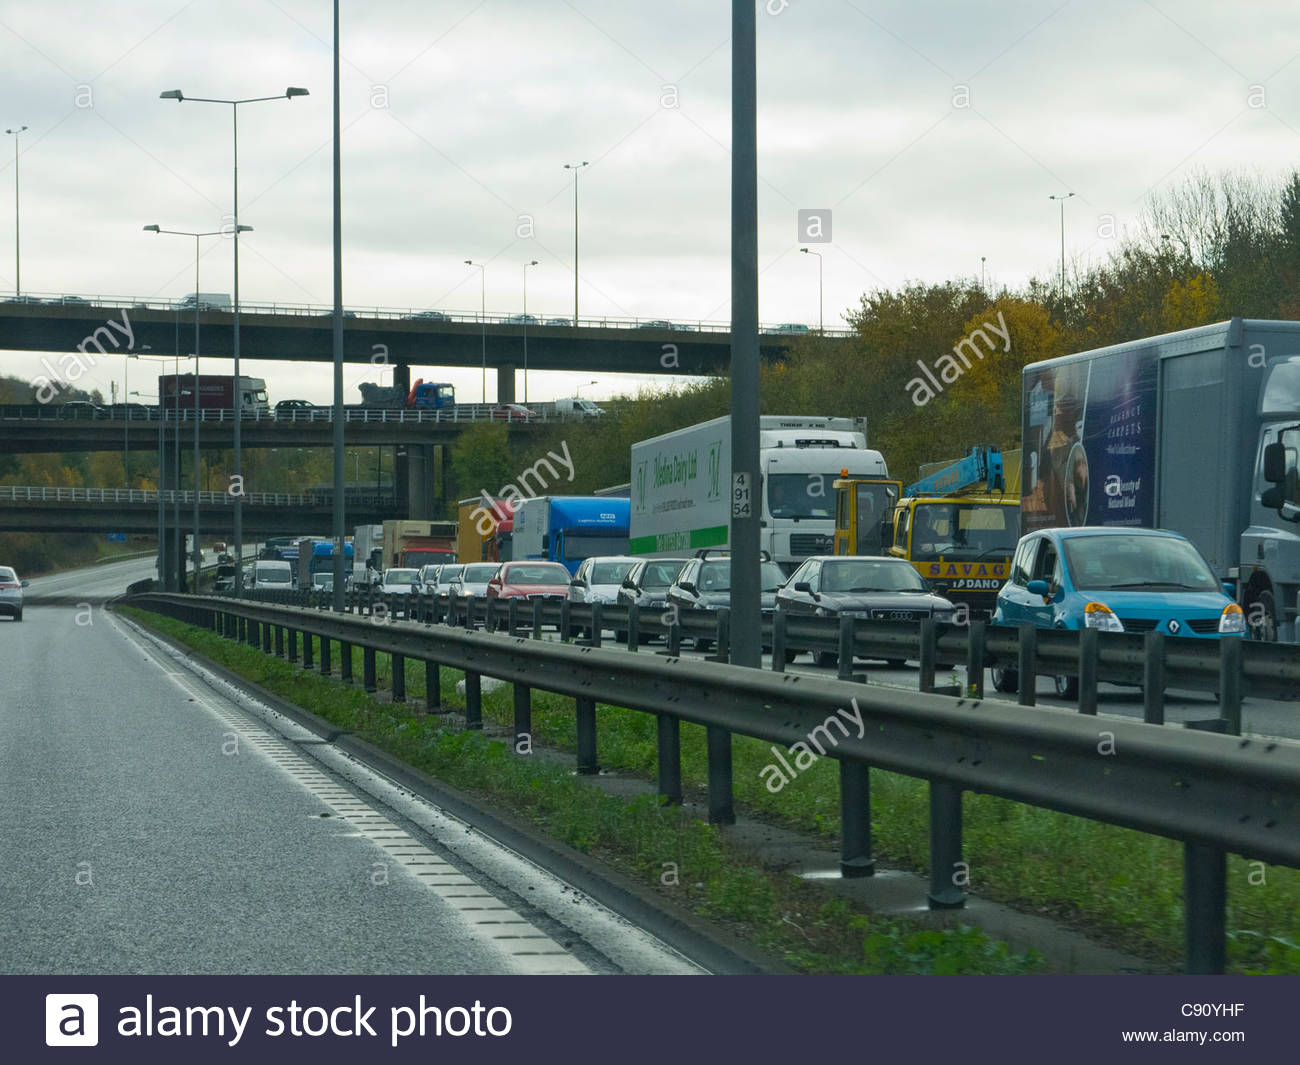 Chaos on the M25 Motor Way England - Stock Image